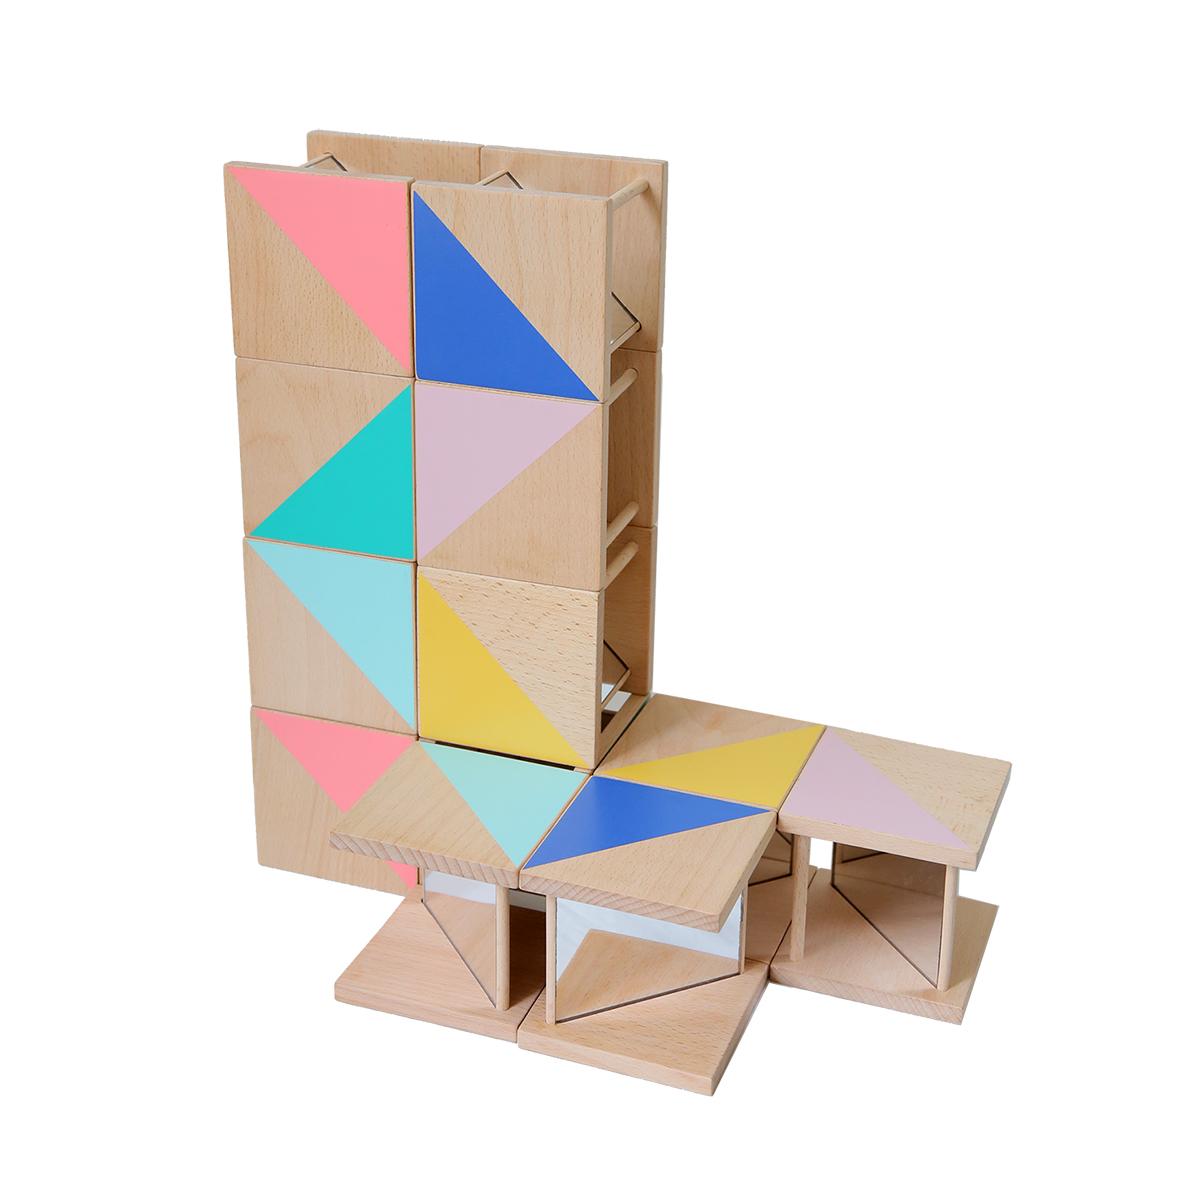 b321211d902832 Ditto (half) – kreatives Holz-Spiegel-Spiel